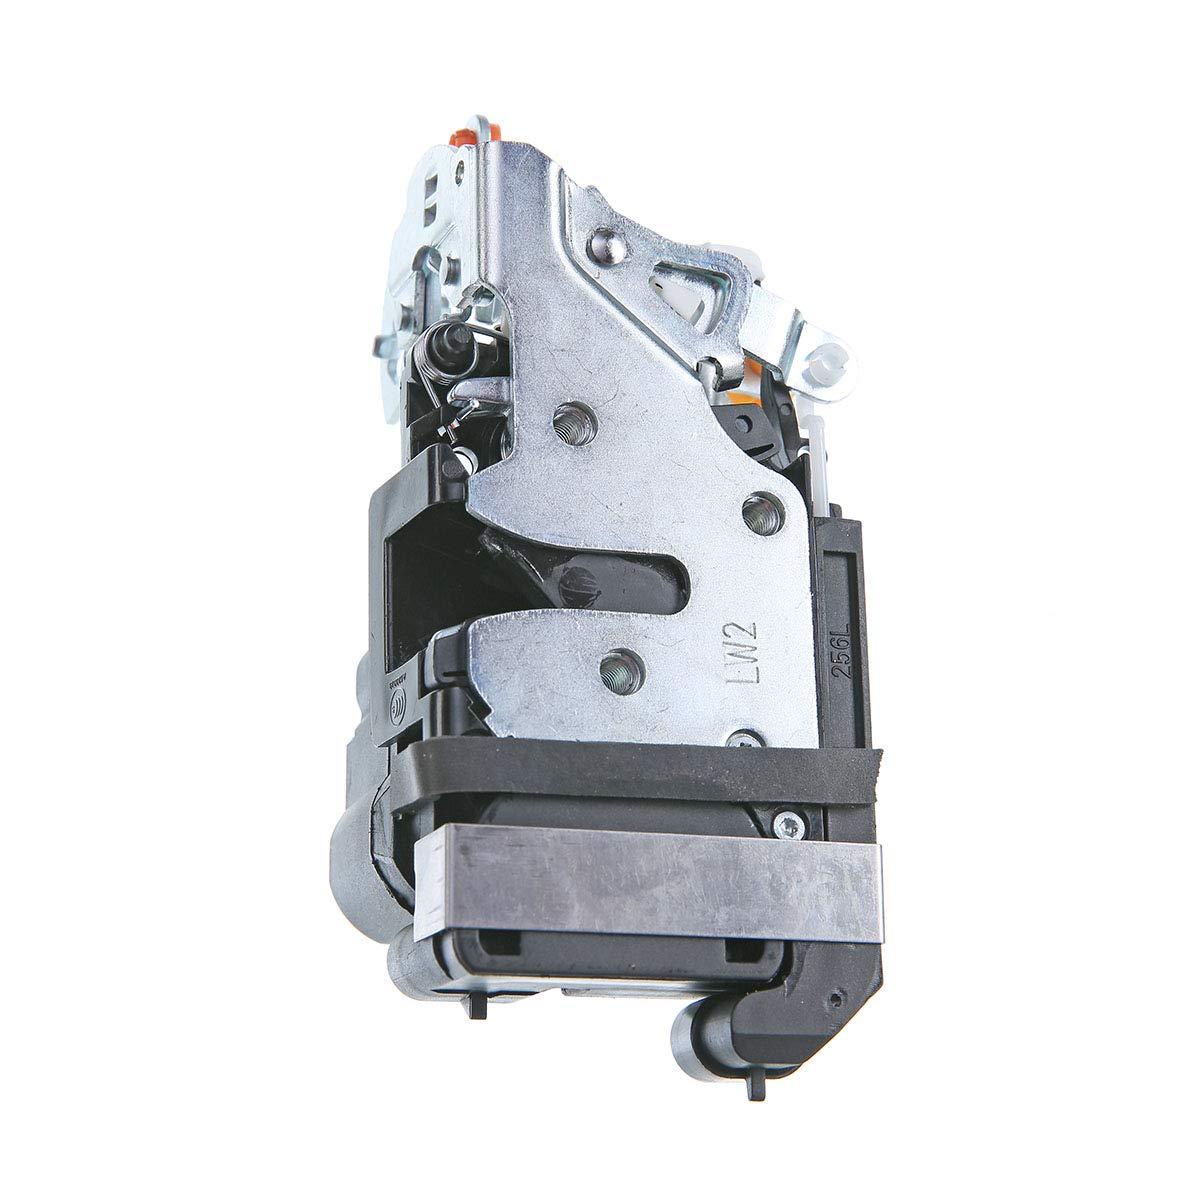 A-Premium Door Lock Actuator Motor for Cadillac Escalade Chevrolet Silverado Avalanche Tahoe GMC Sierra Yukon Front Left Driver Side